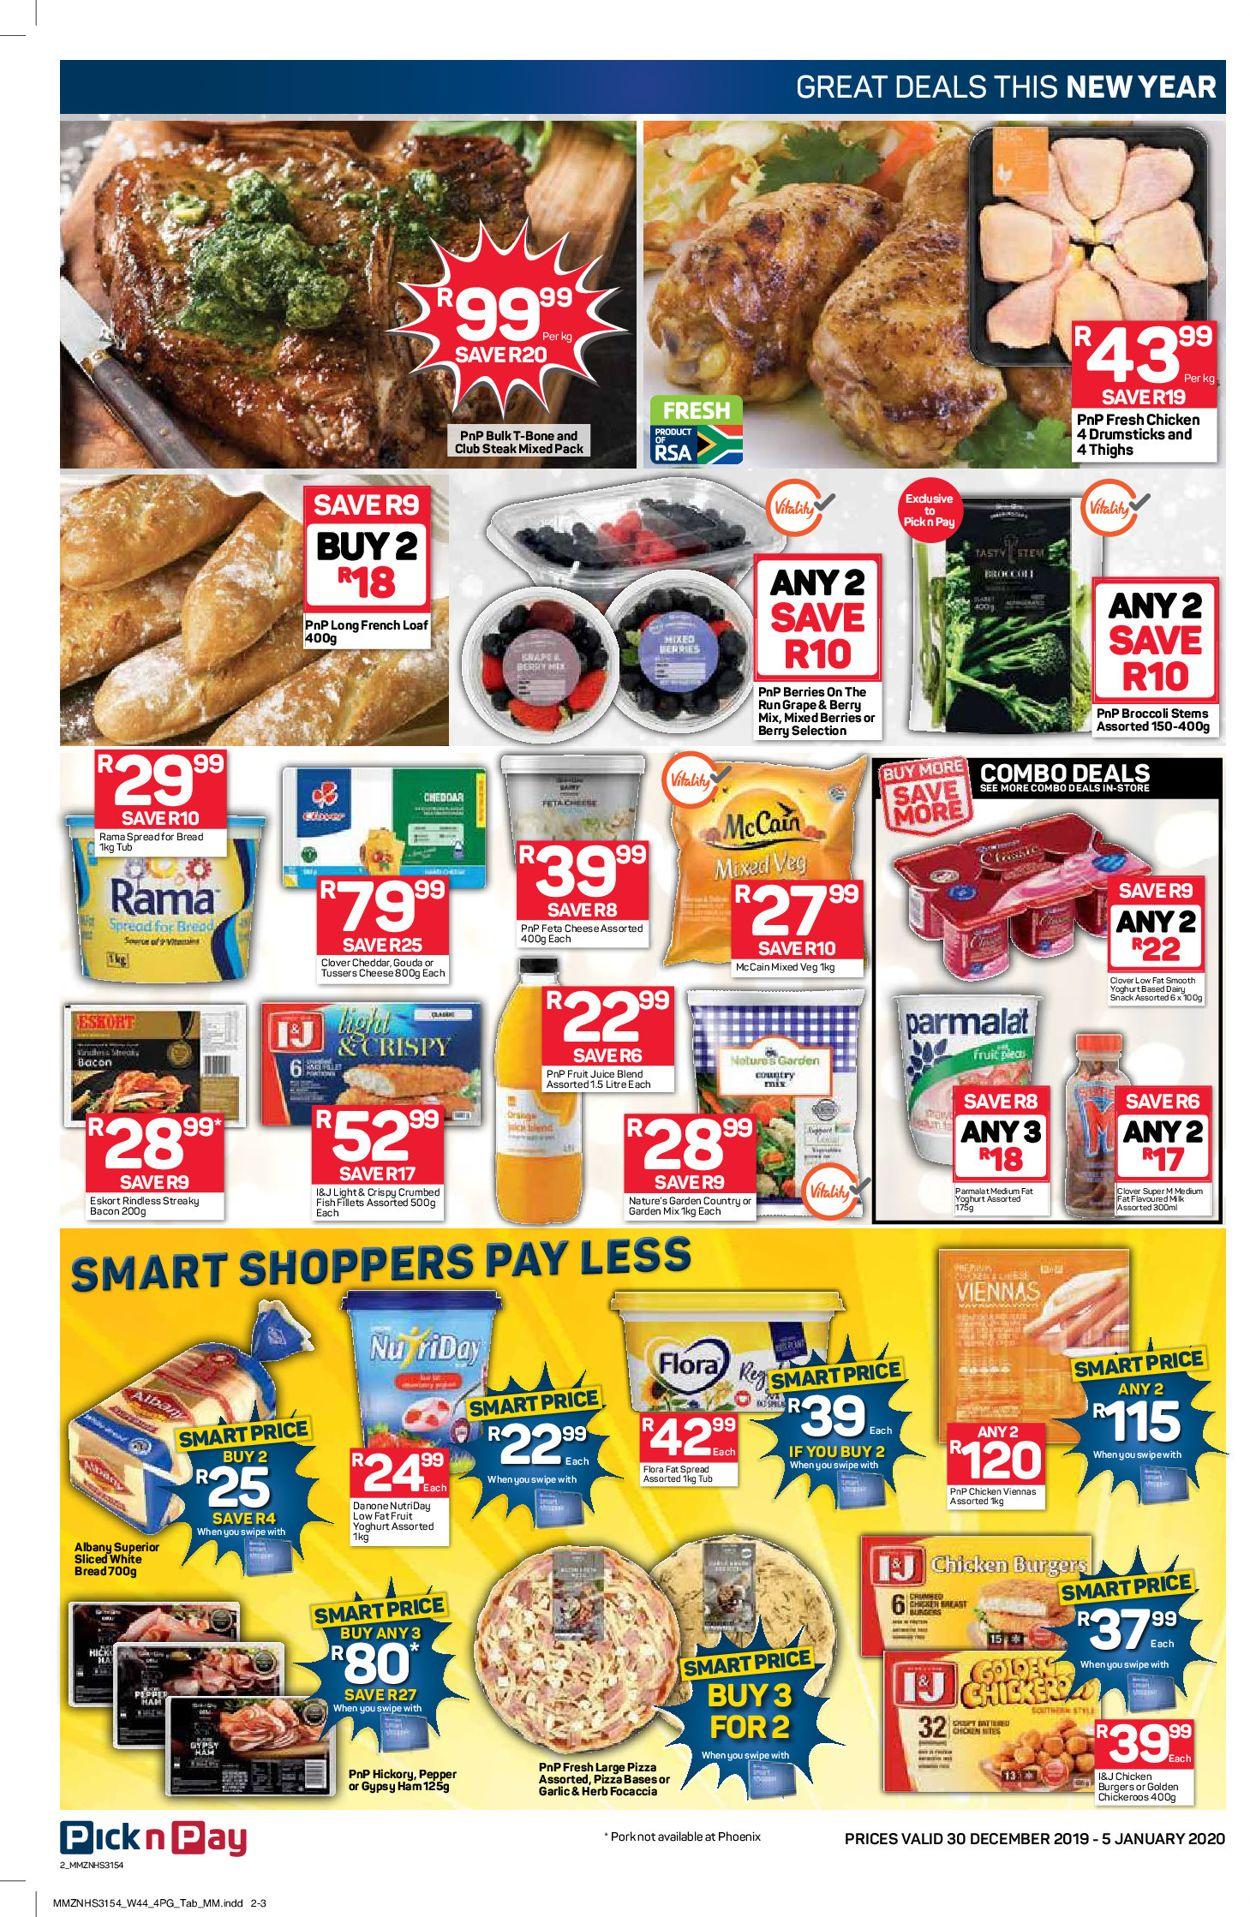 Pick n Pay New Year Catalogue 19/20 Catalogue - 2019/12/30-2020/01/05 (Page 3)